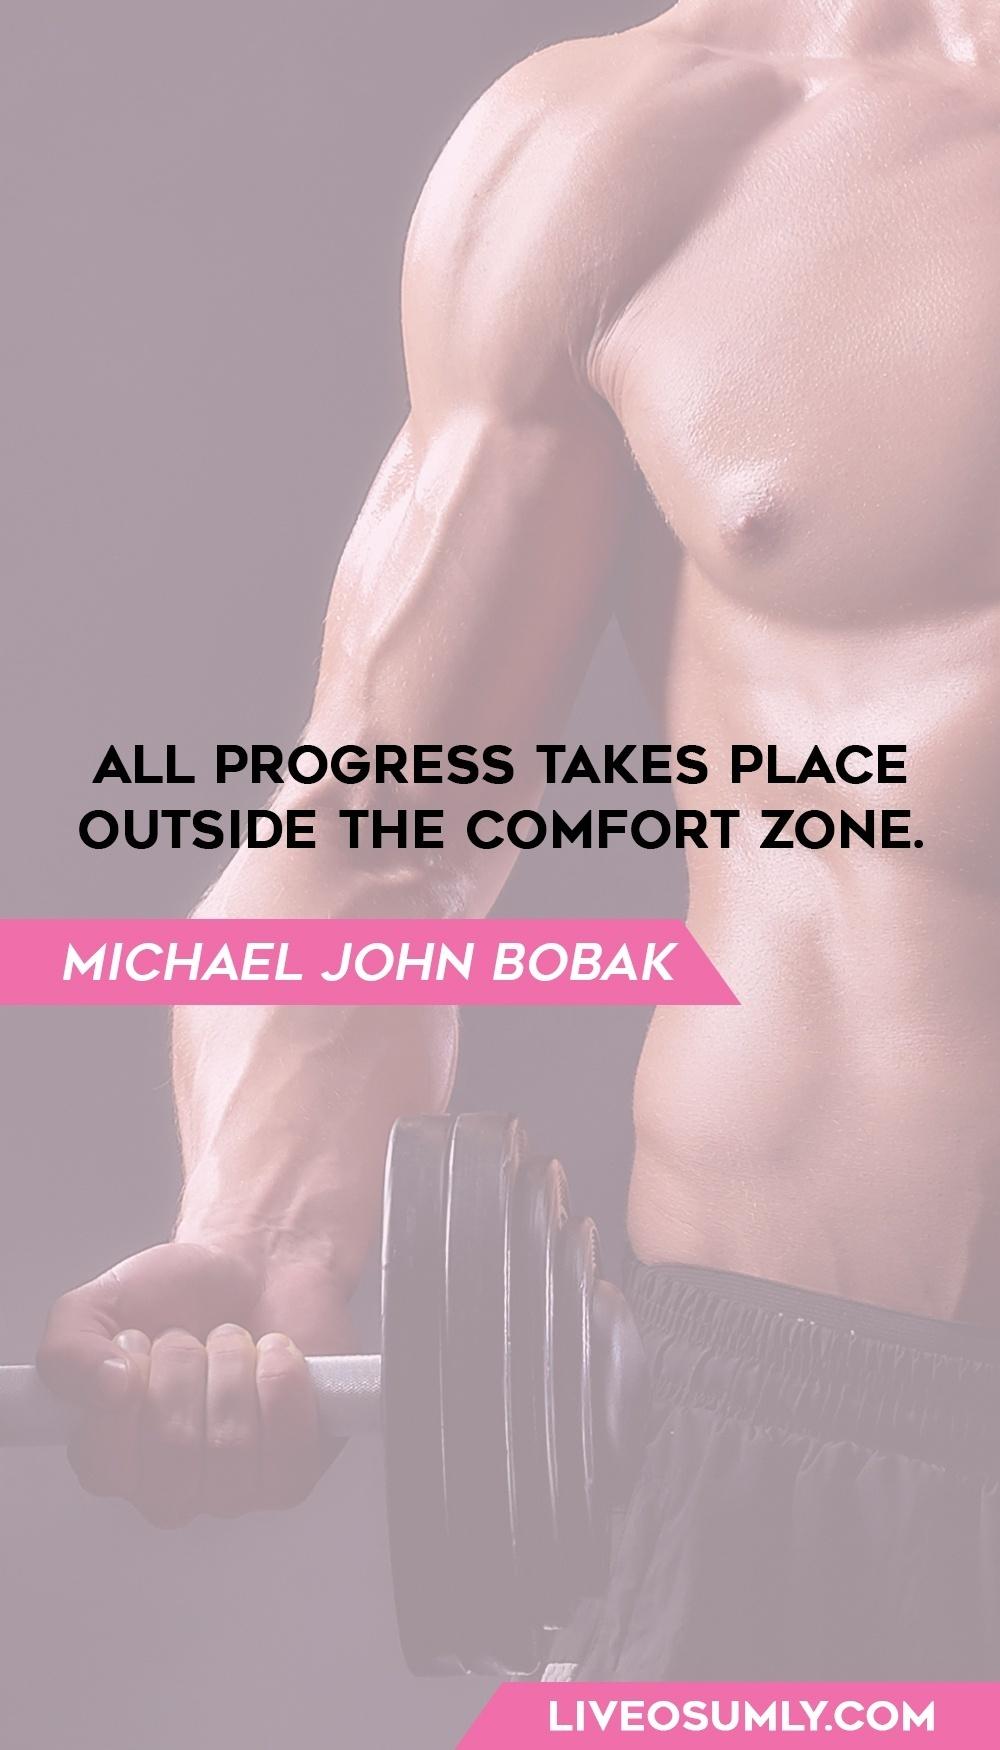 49. Michael John Bobak Fitness Quotes